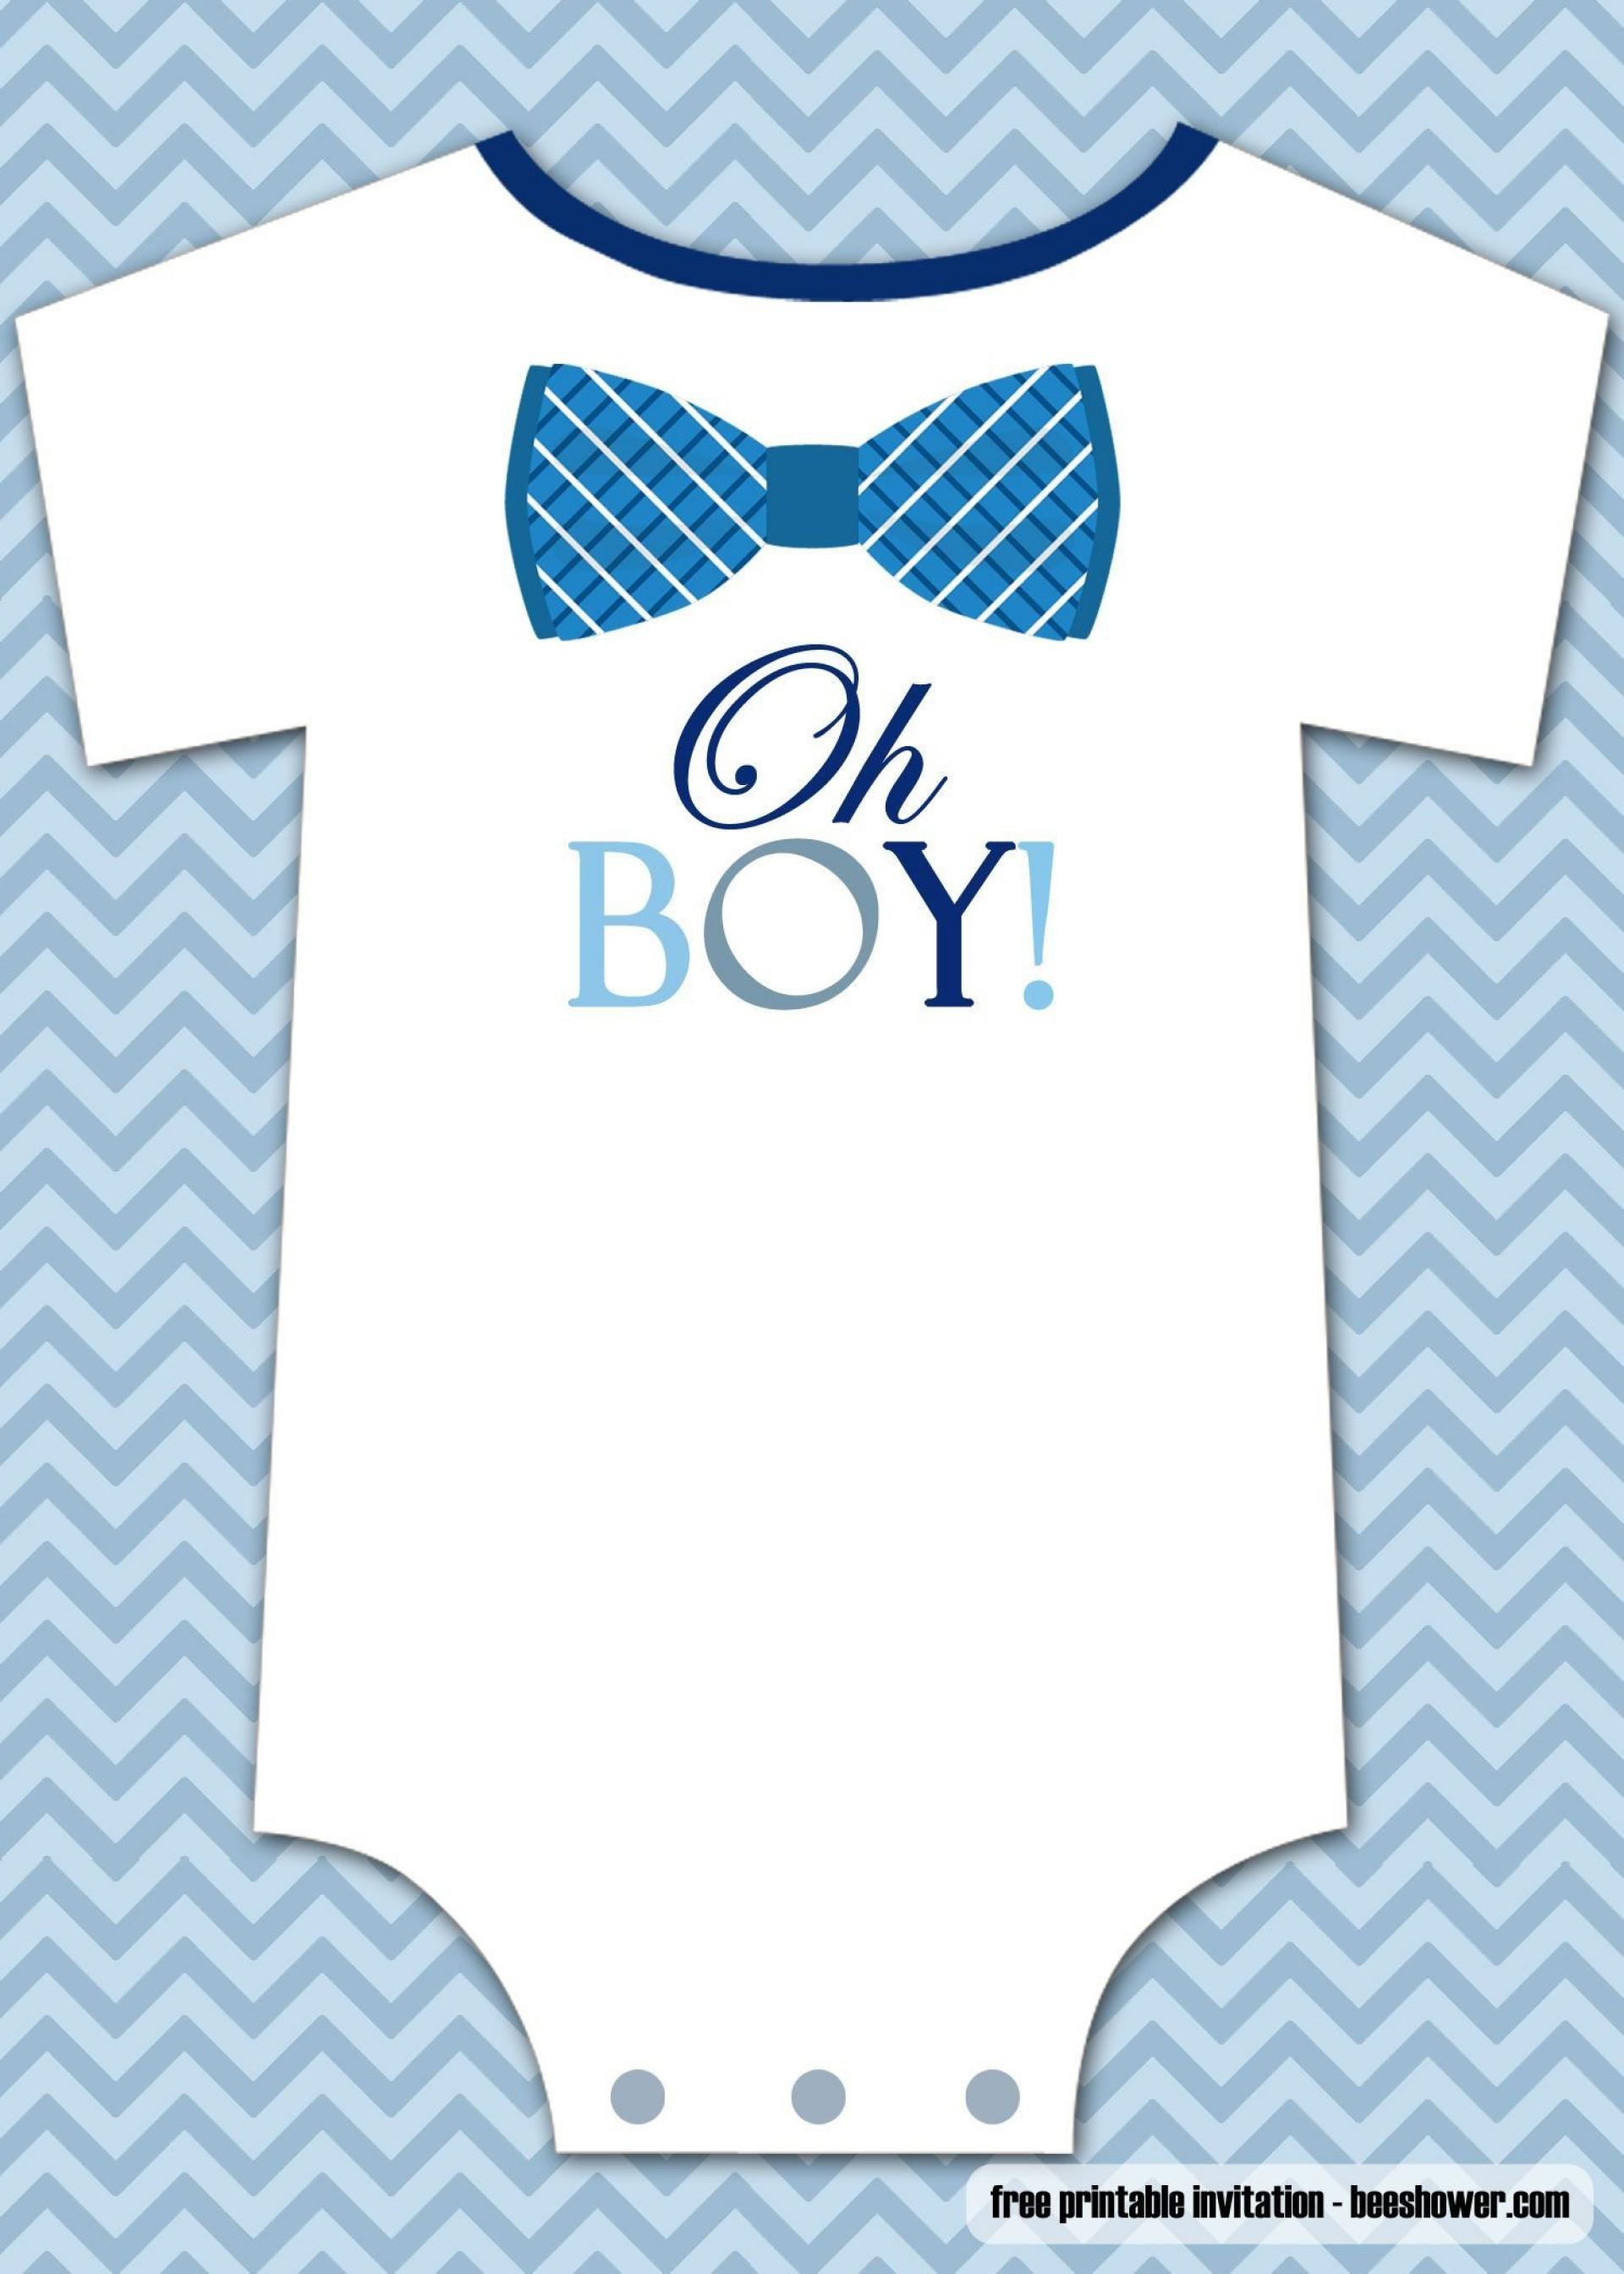 000 Stunning Onesie Baby Shower Invitation Template Inspiration  Free1920